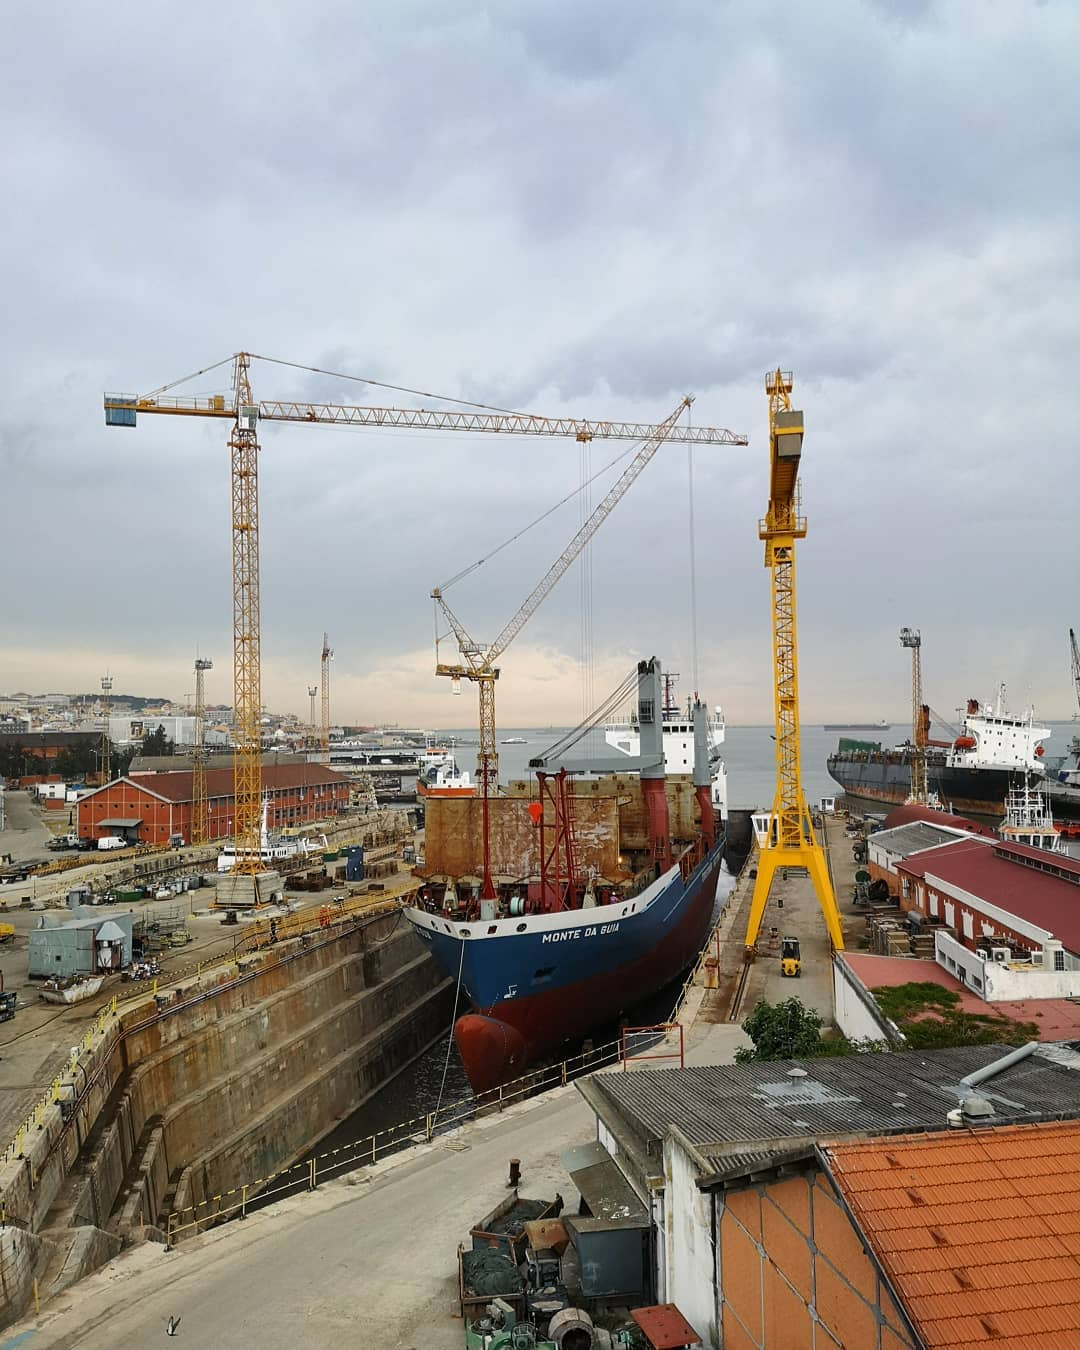 The port of Lisbon